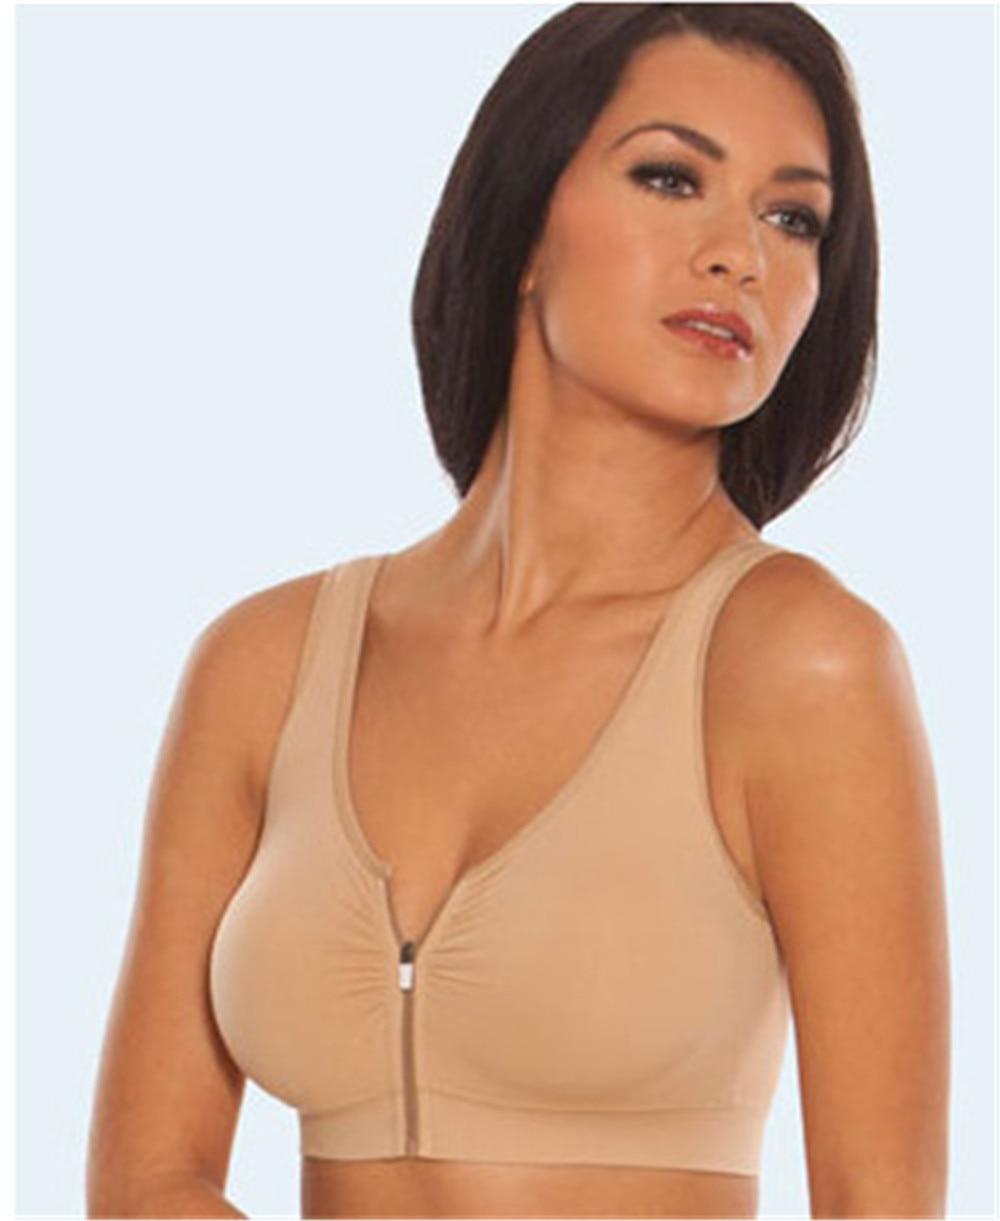 906c7680a5ef2 As Seen On TV Seamless Genie zip Bra women push up bra Relax sleeping bra  students daily underwear NRWX008-in Bras from Underwear   Sleepwears on ...